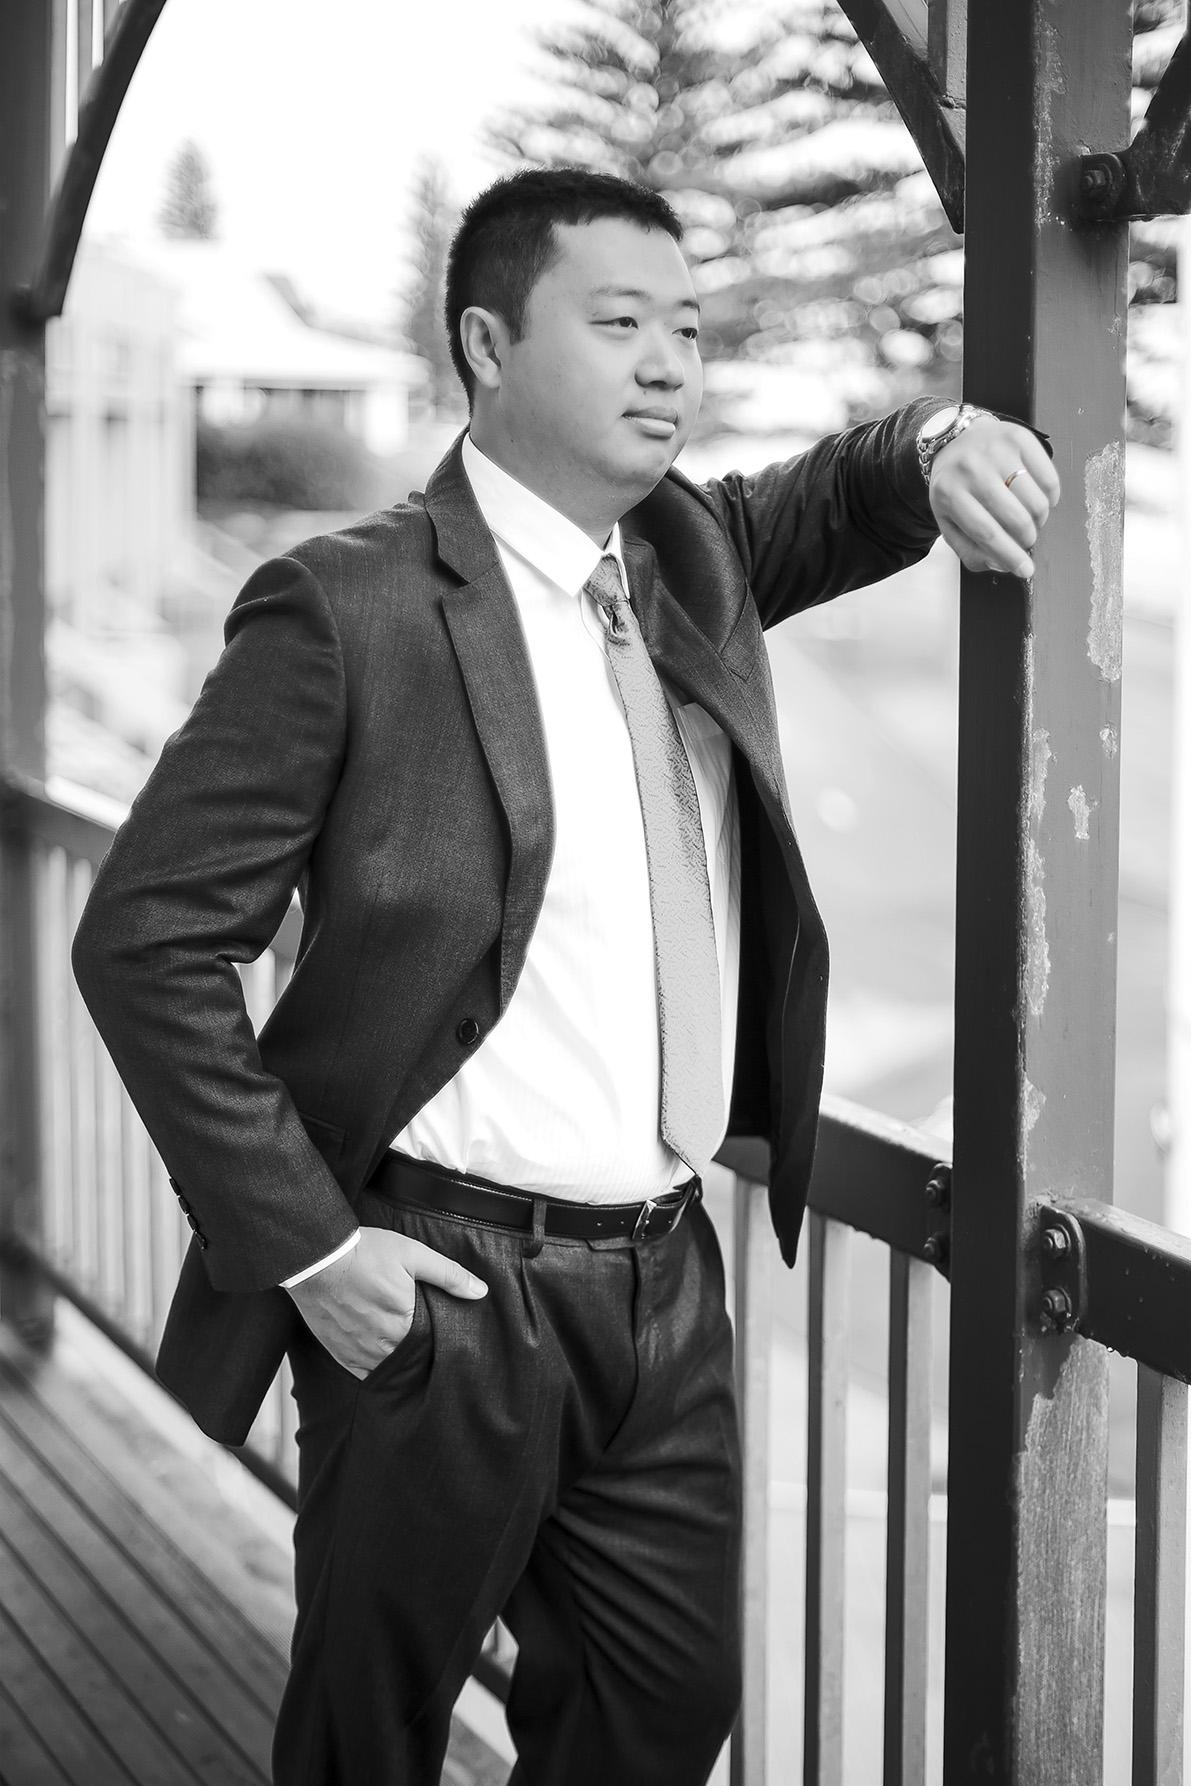 Black and white film style groom preparation photo 2